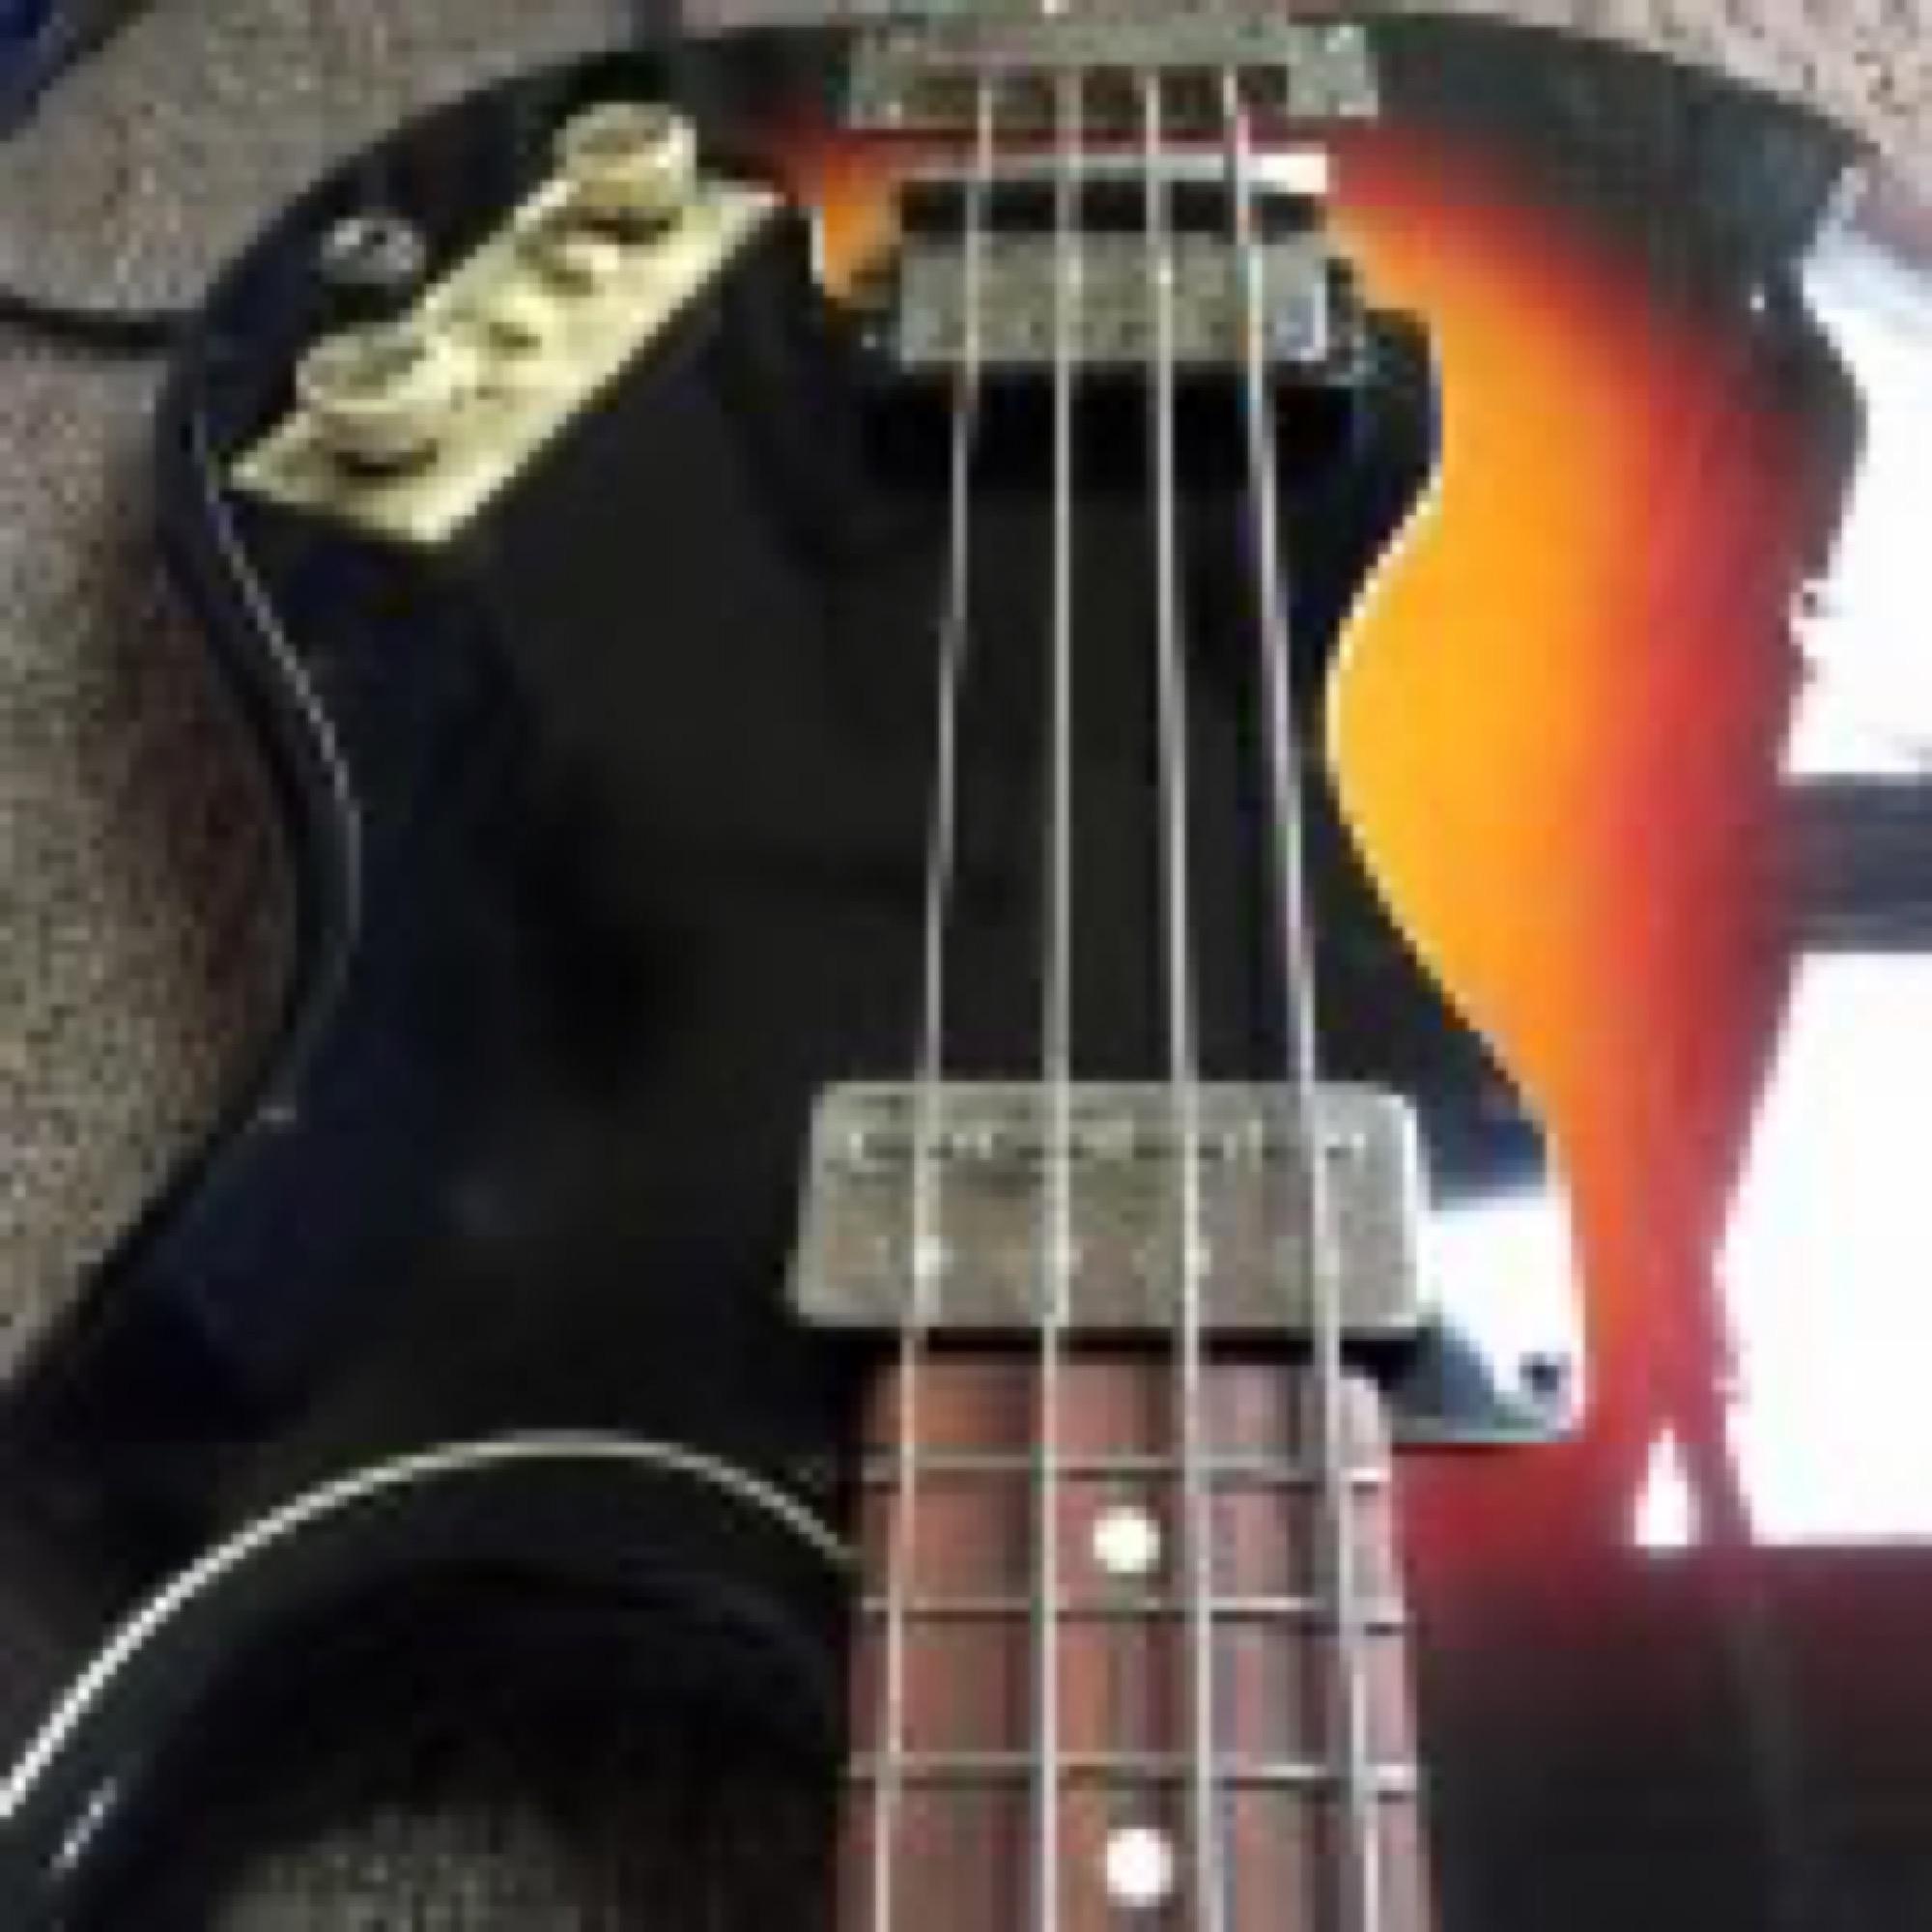 62/3 Hofner 182 Shortscale Bass